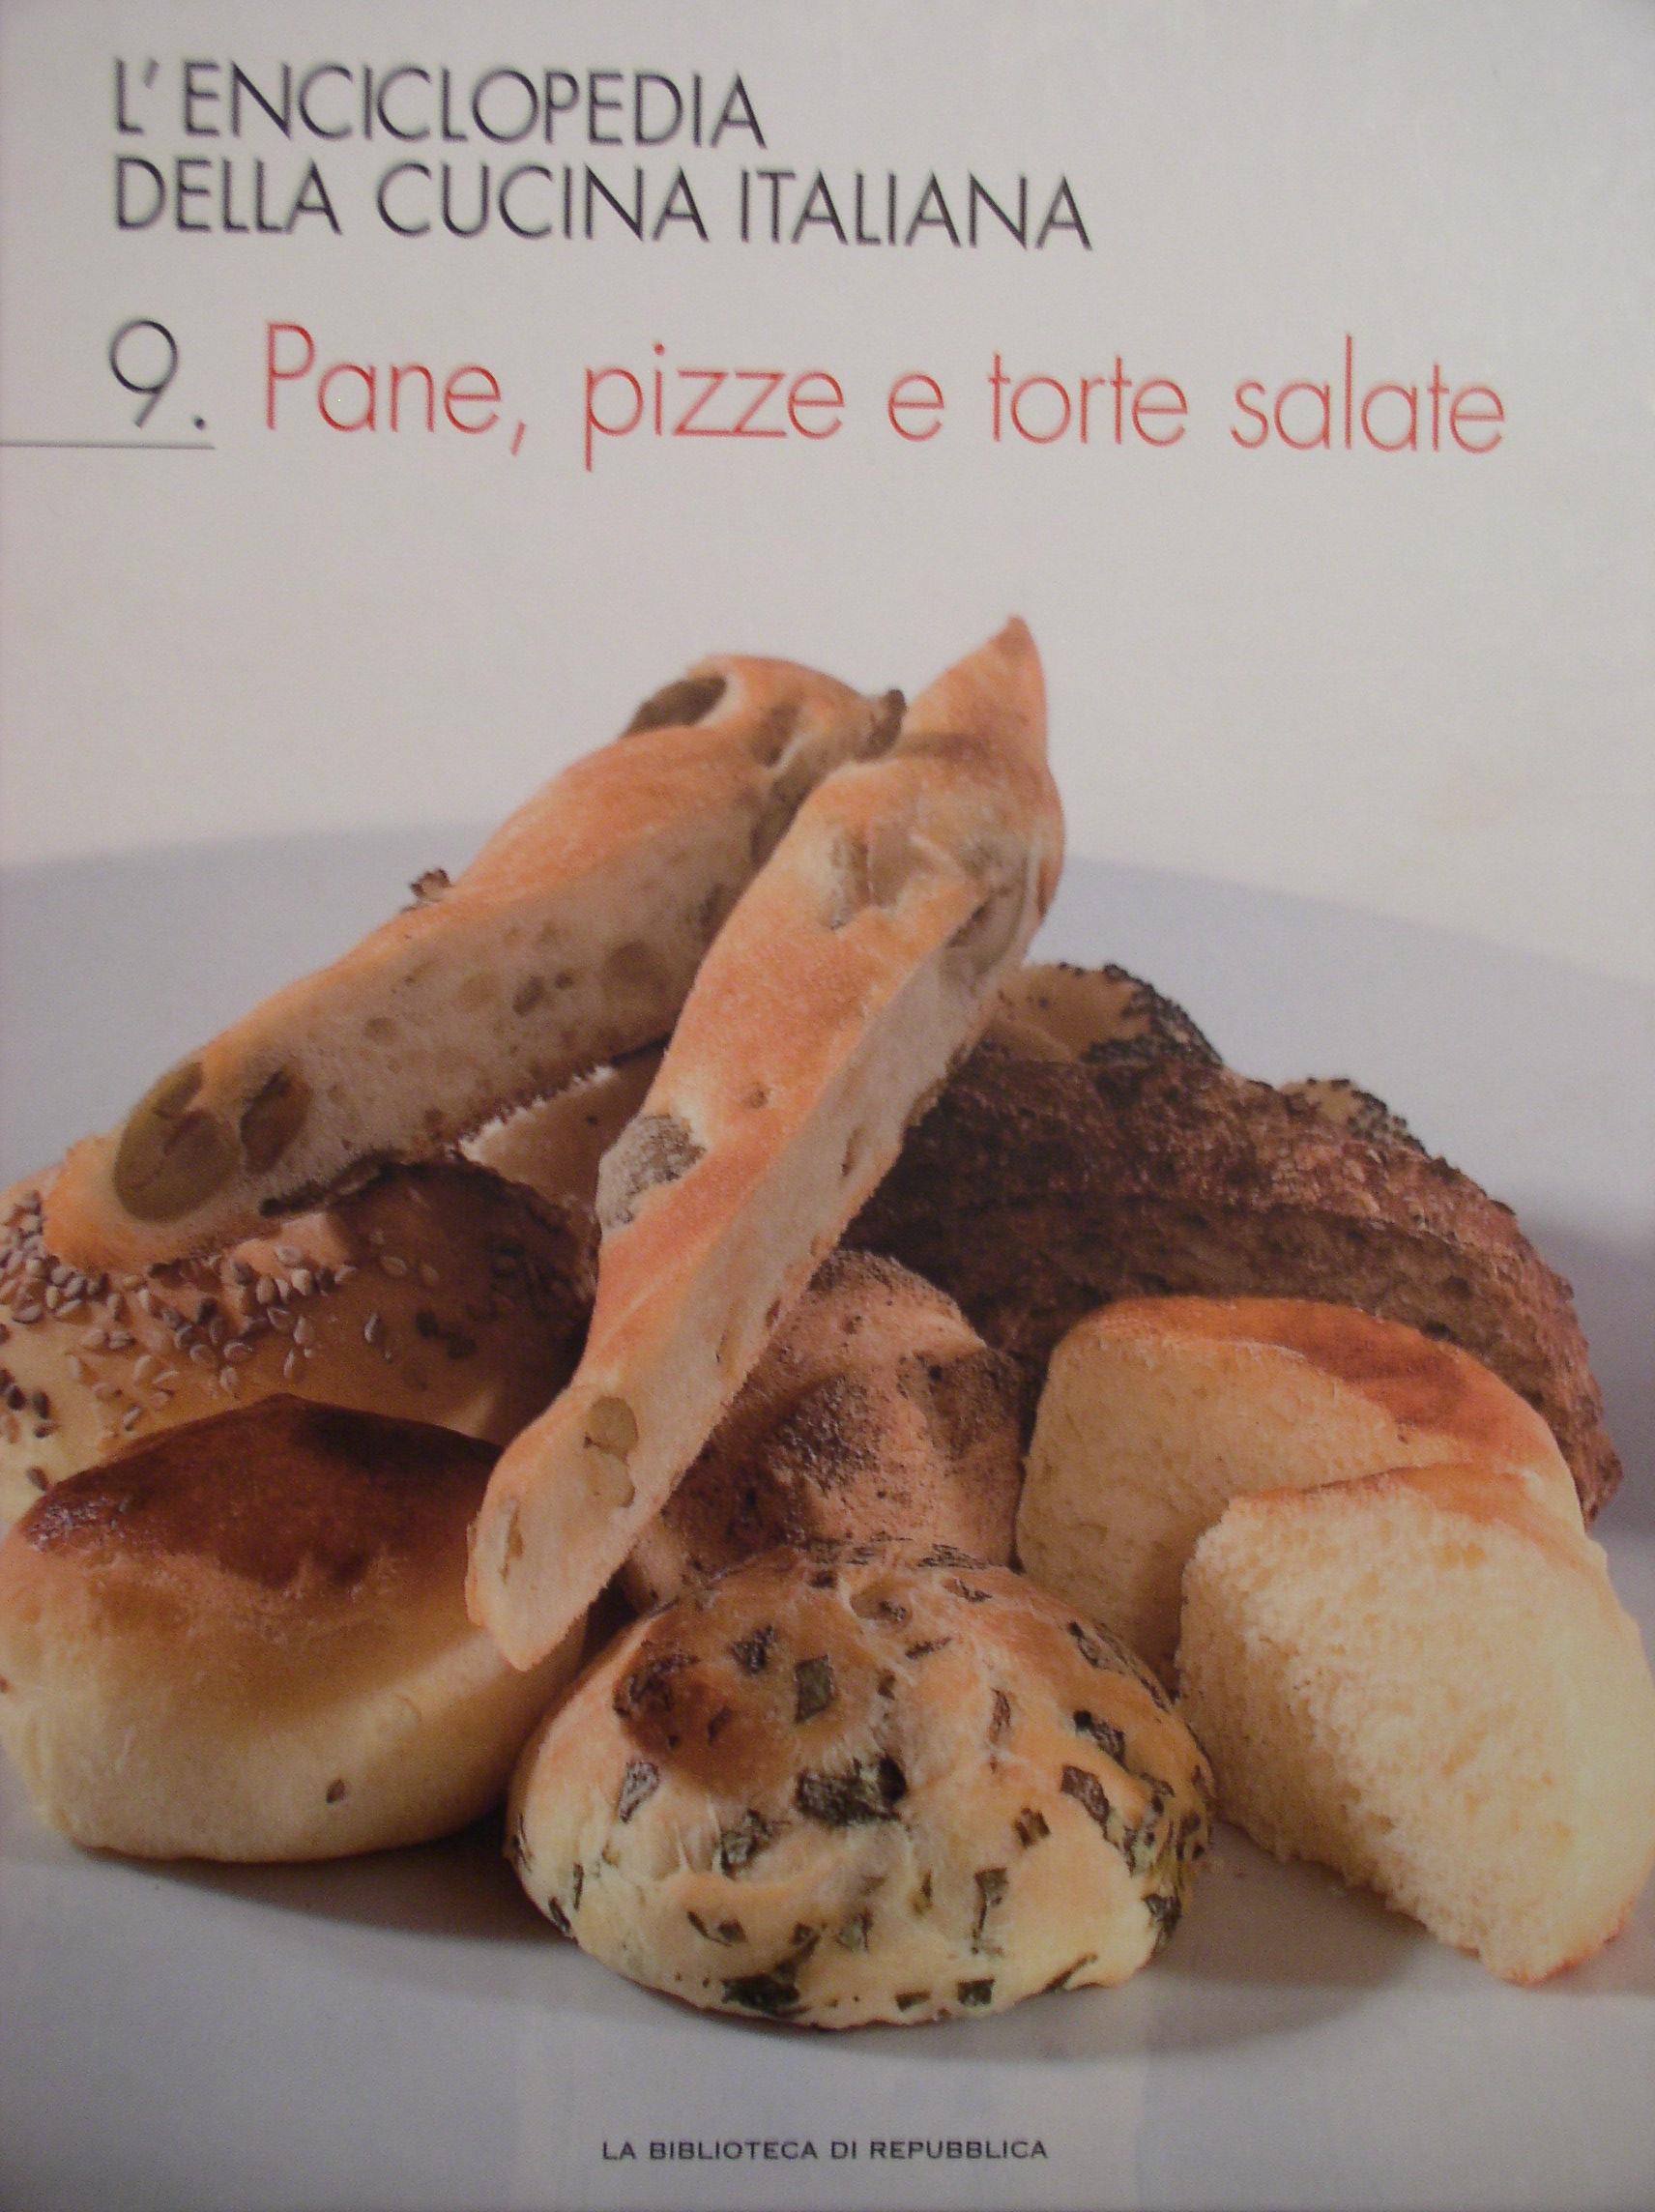 L'Enciclopedia della cucina italiana 9